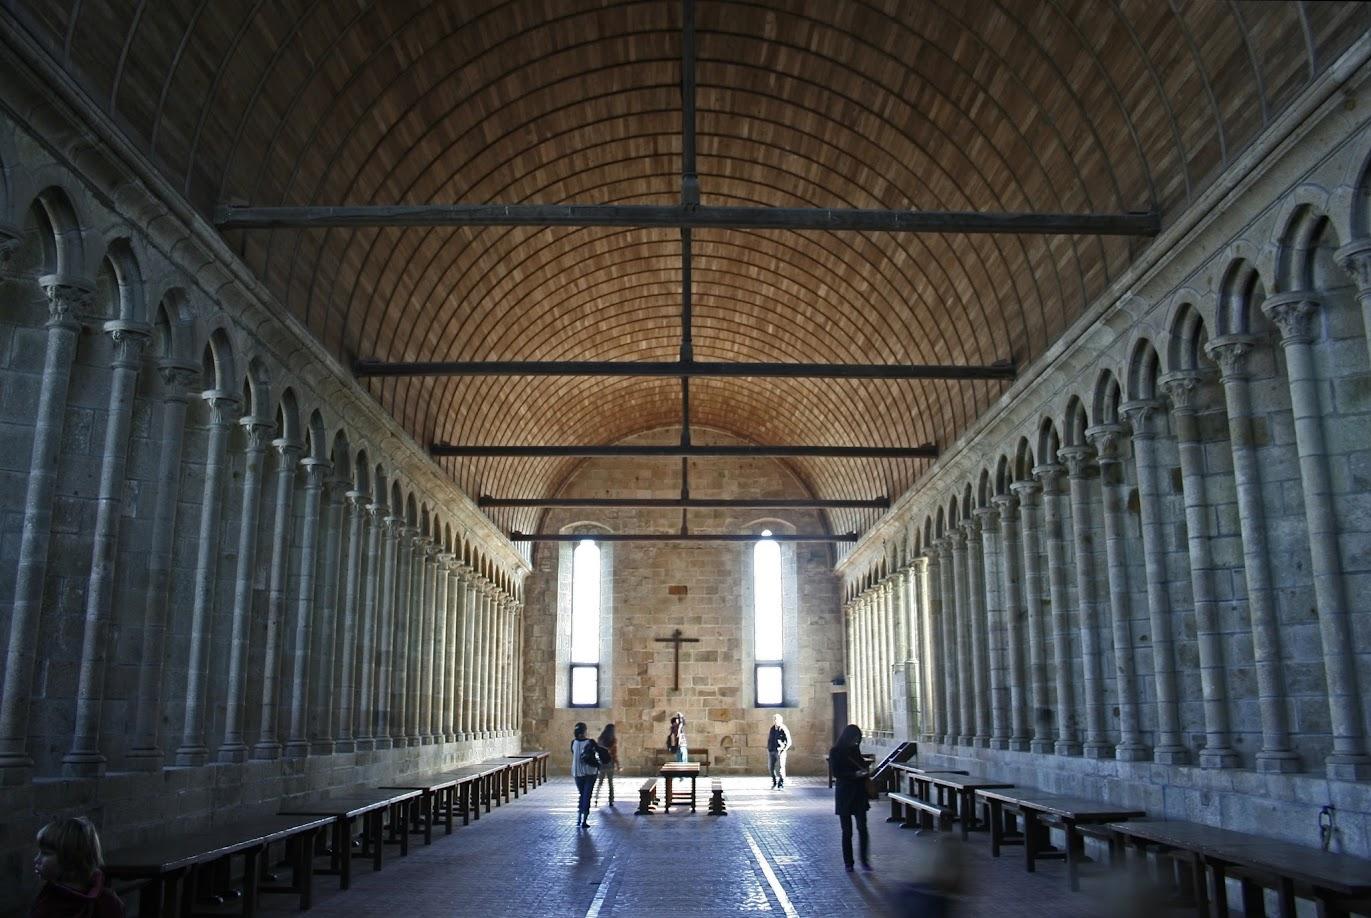 Трапезная - Mont Saint-Michel (аббатство Мон Сен-Мишель)